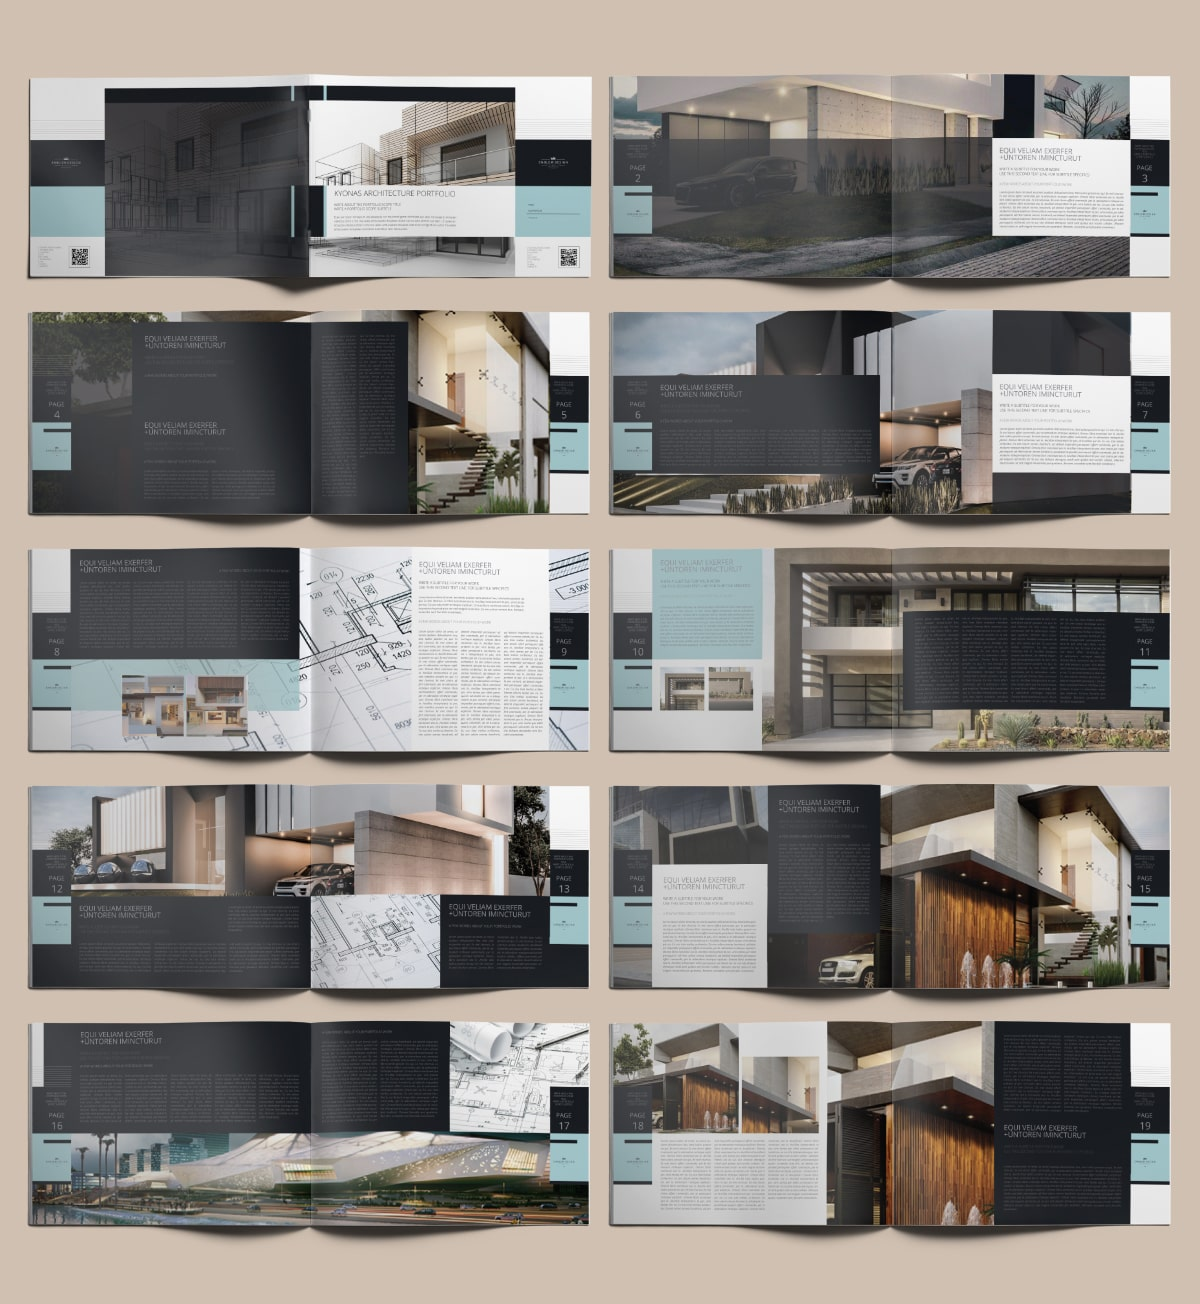 Kyonas Architecture Portfolio A4 Landscape - Layouts